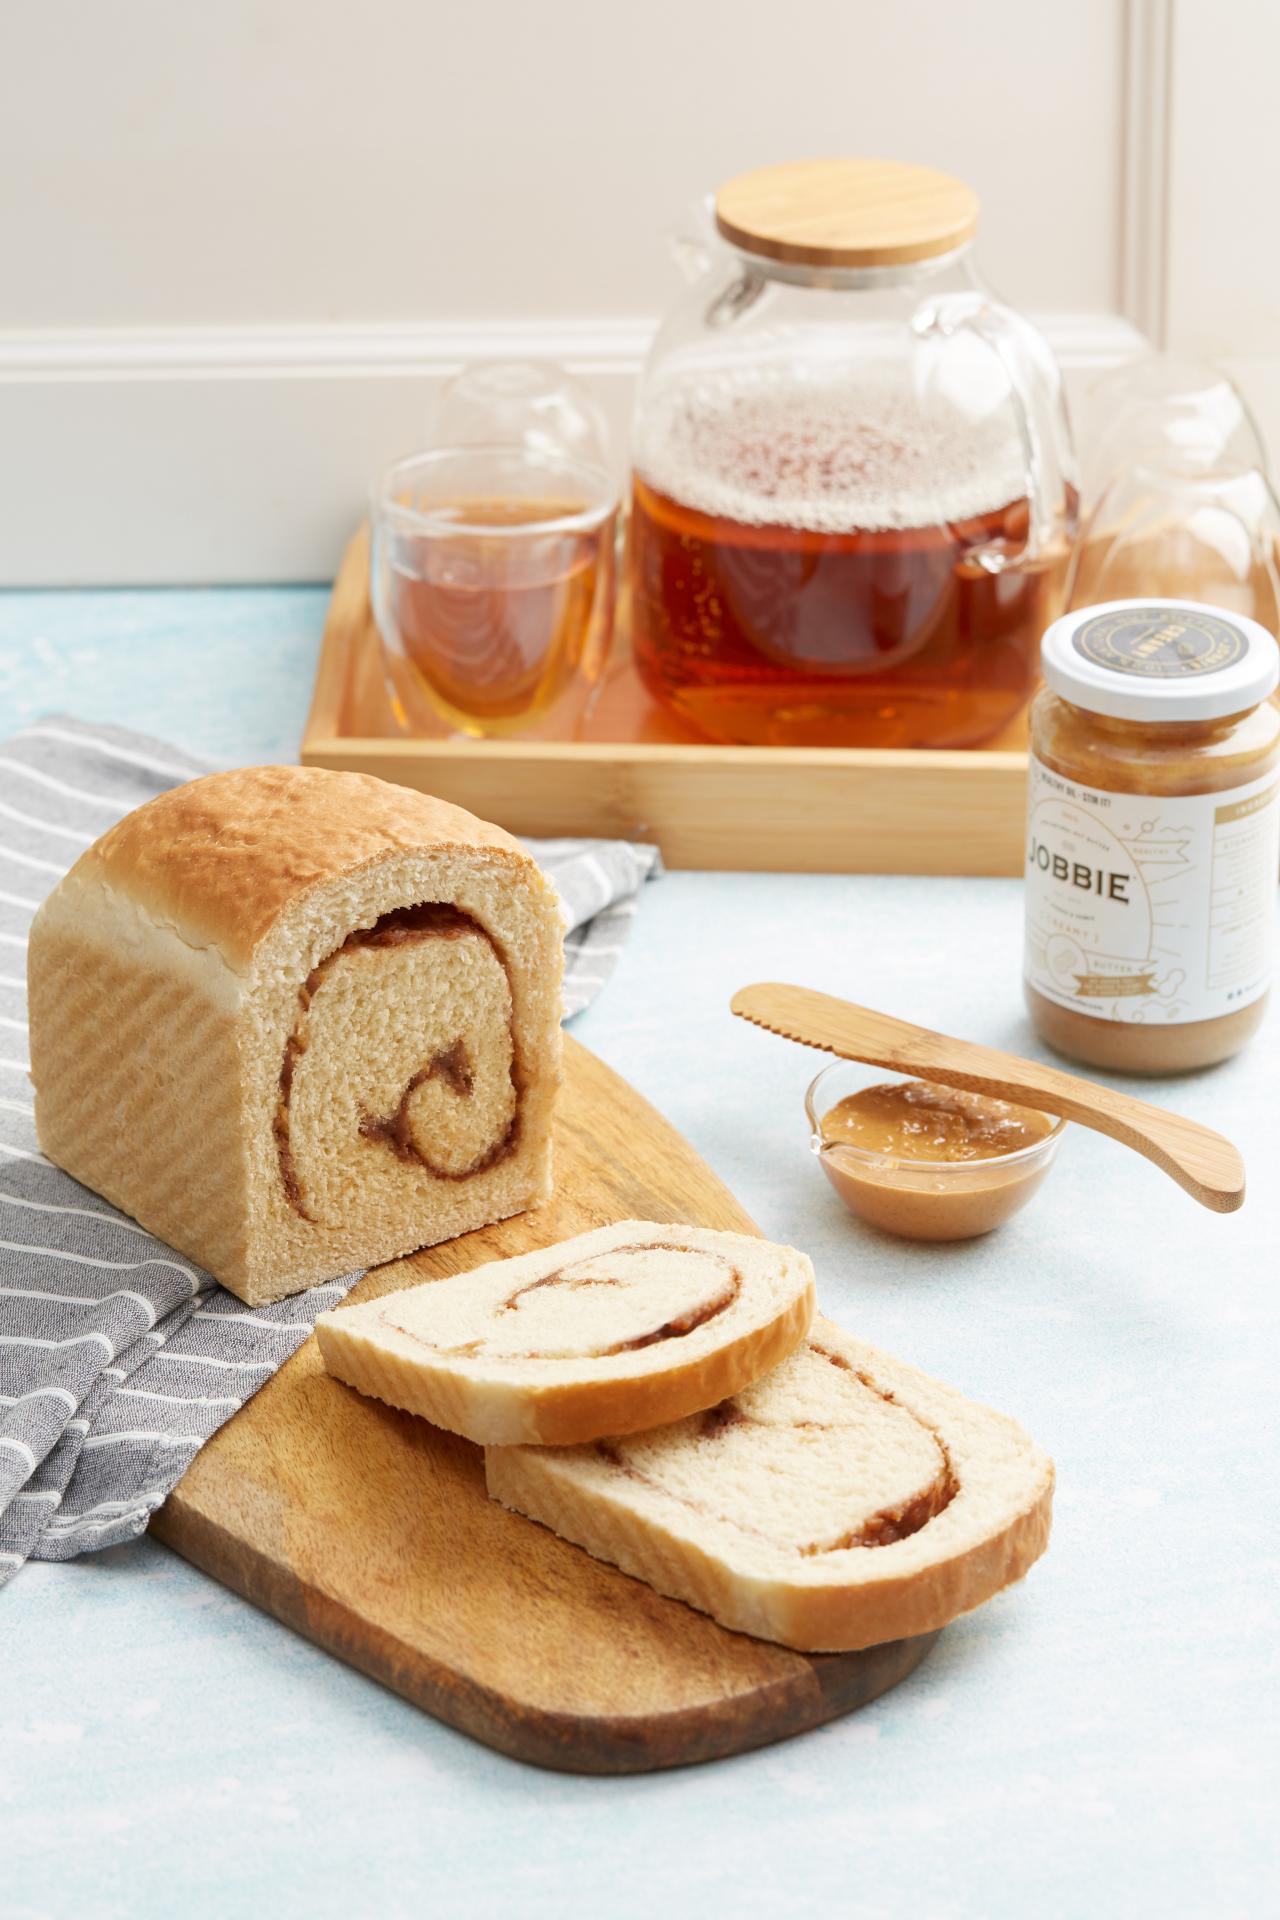 Vegan JOBBIE Peanut Butter Jam Swirl Bread